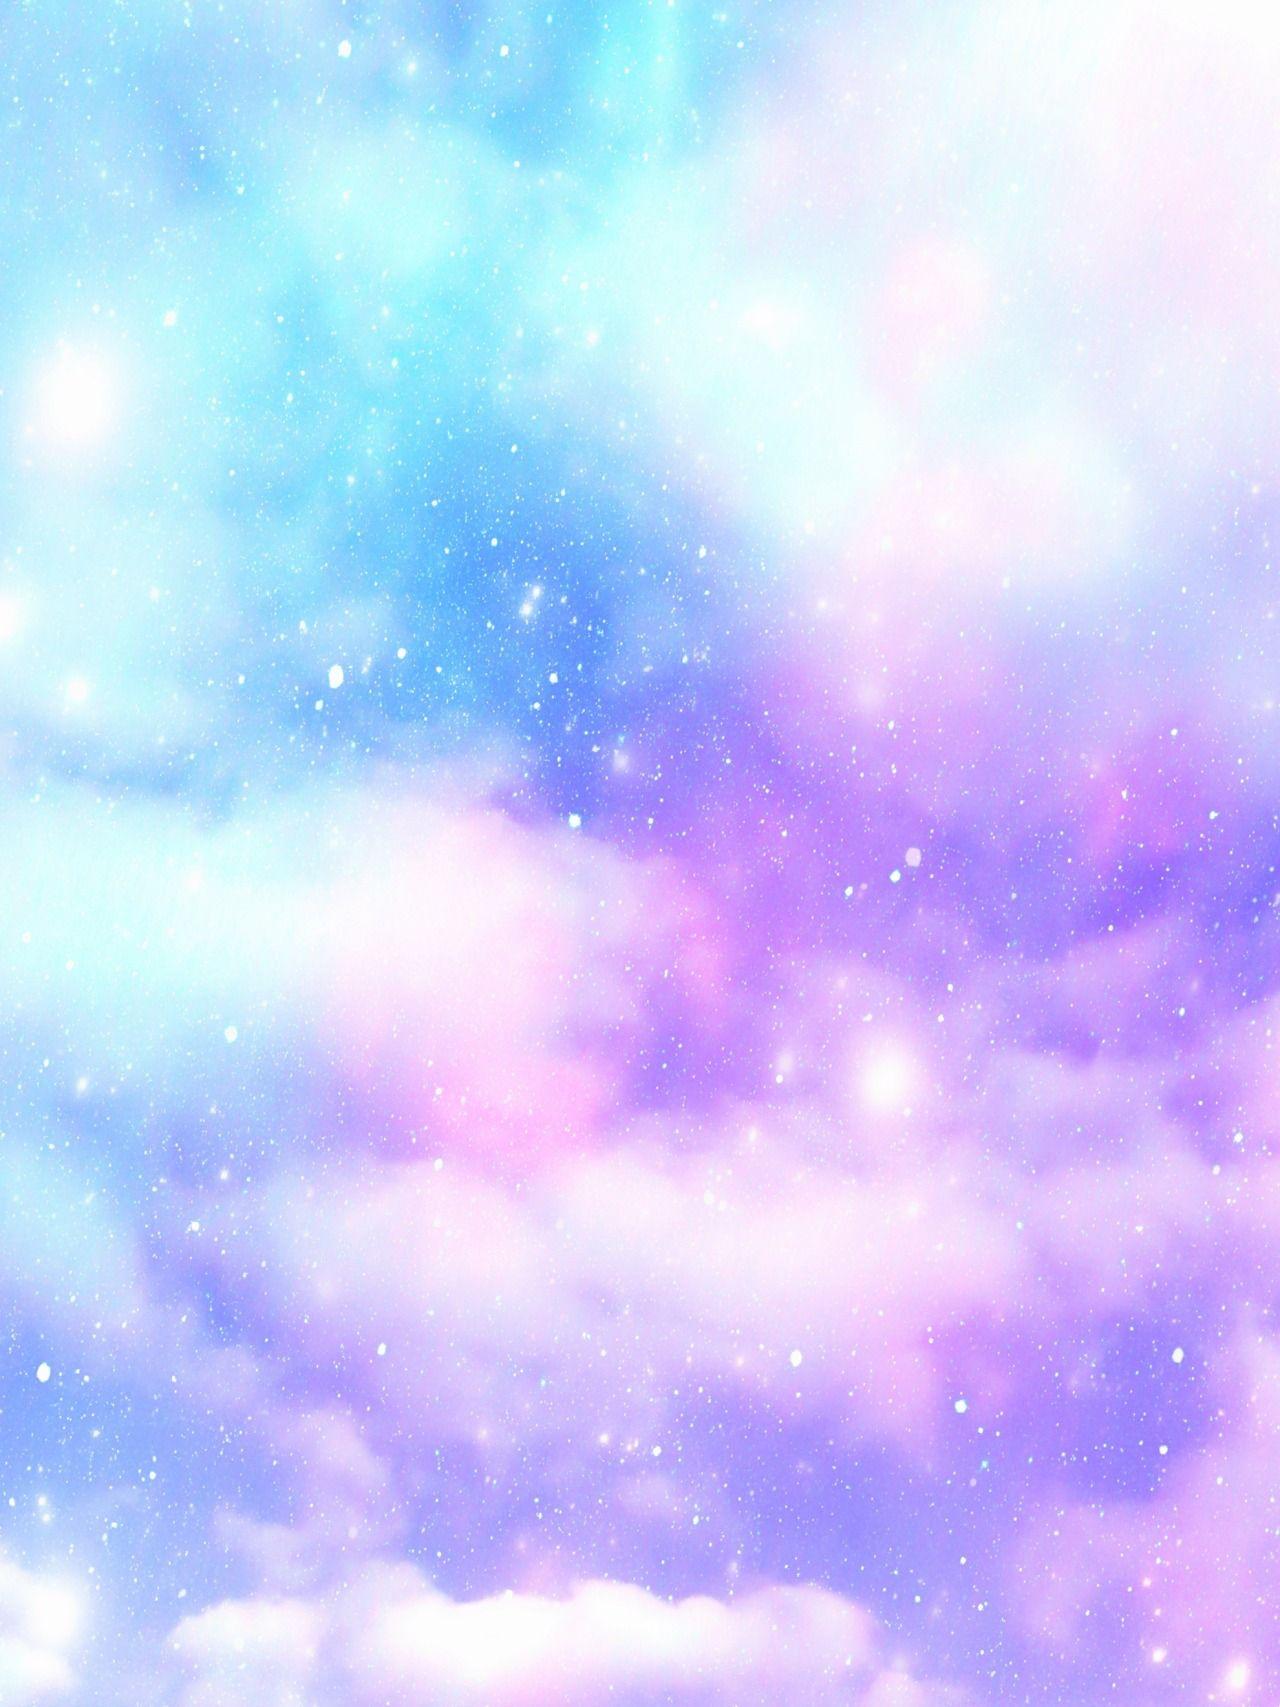 Secrets Of Secrets Cute Galaxy Wallpaper Pretty Wallpapers Unicorn Wallpaper